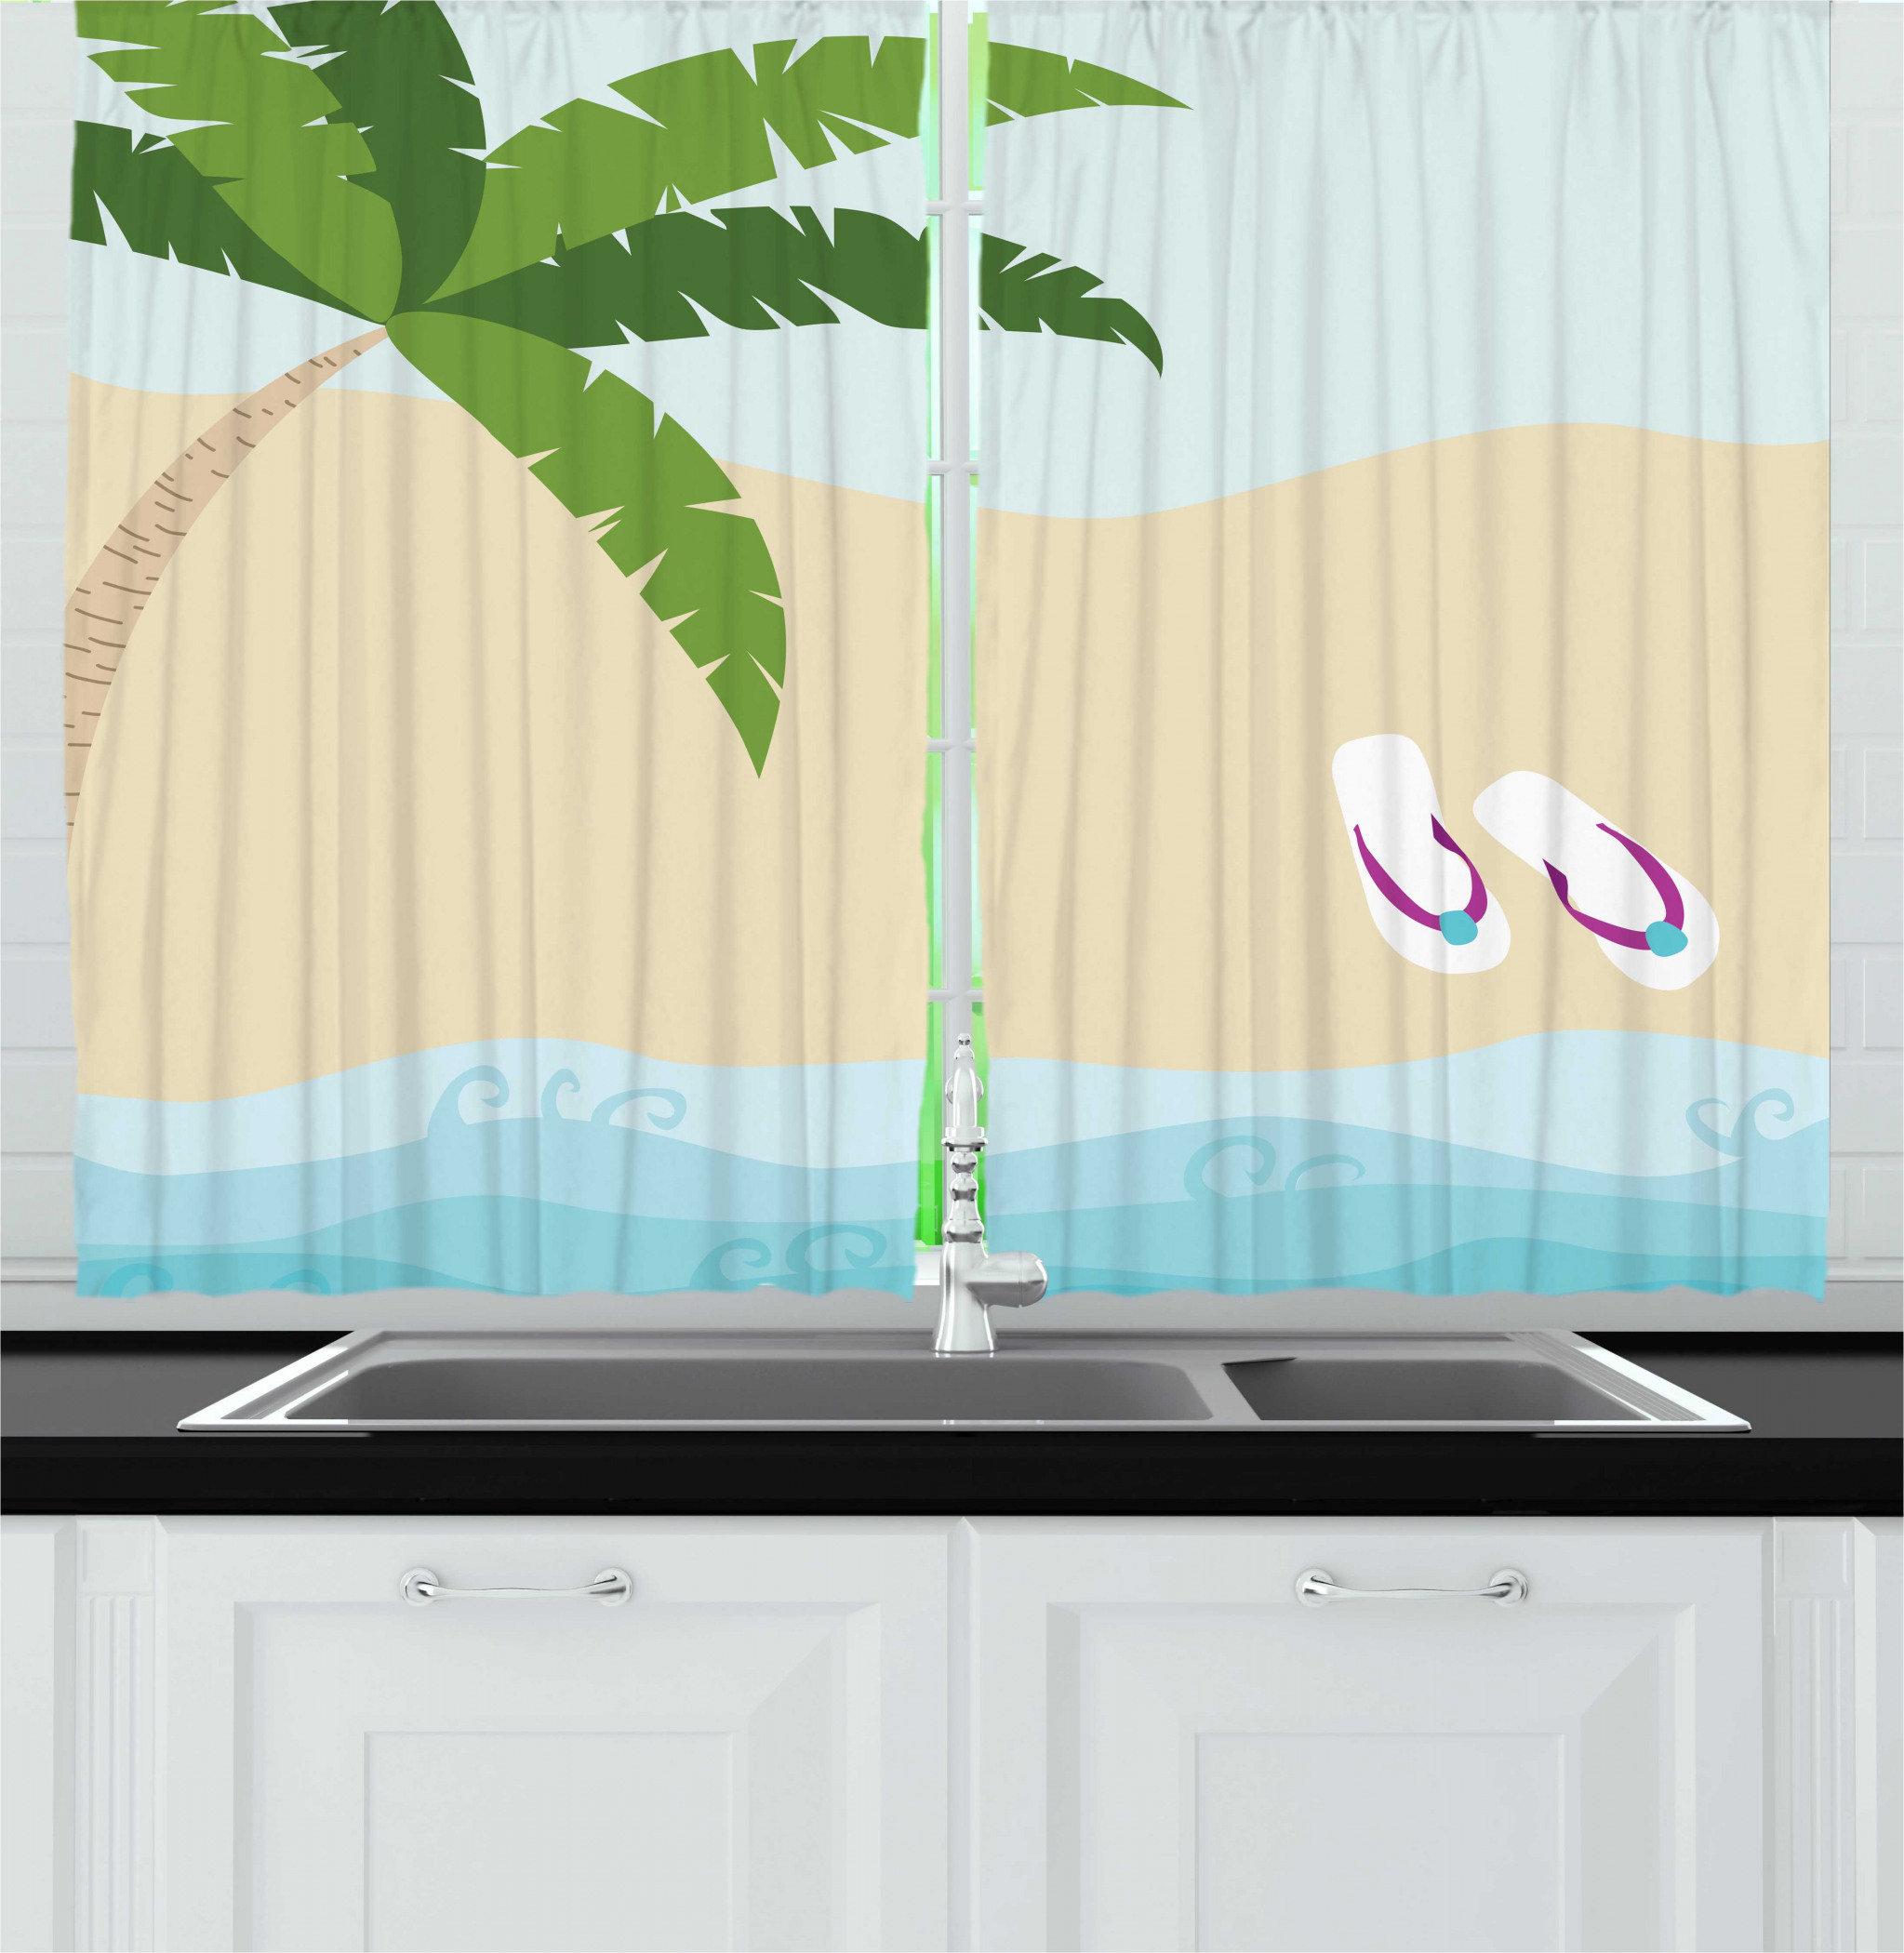 East Urban Home 2 Piece Graphic Beach Summer Cartoon Of Palm Tree And Flip Flops On Sandy Ocean Coast Print Kitchen Curtain Set Wayfair